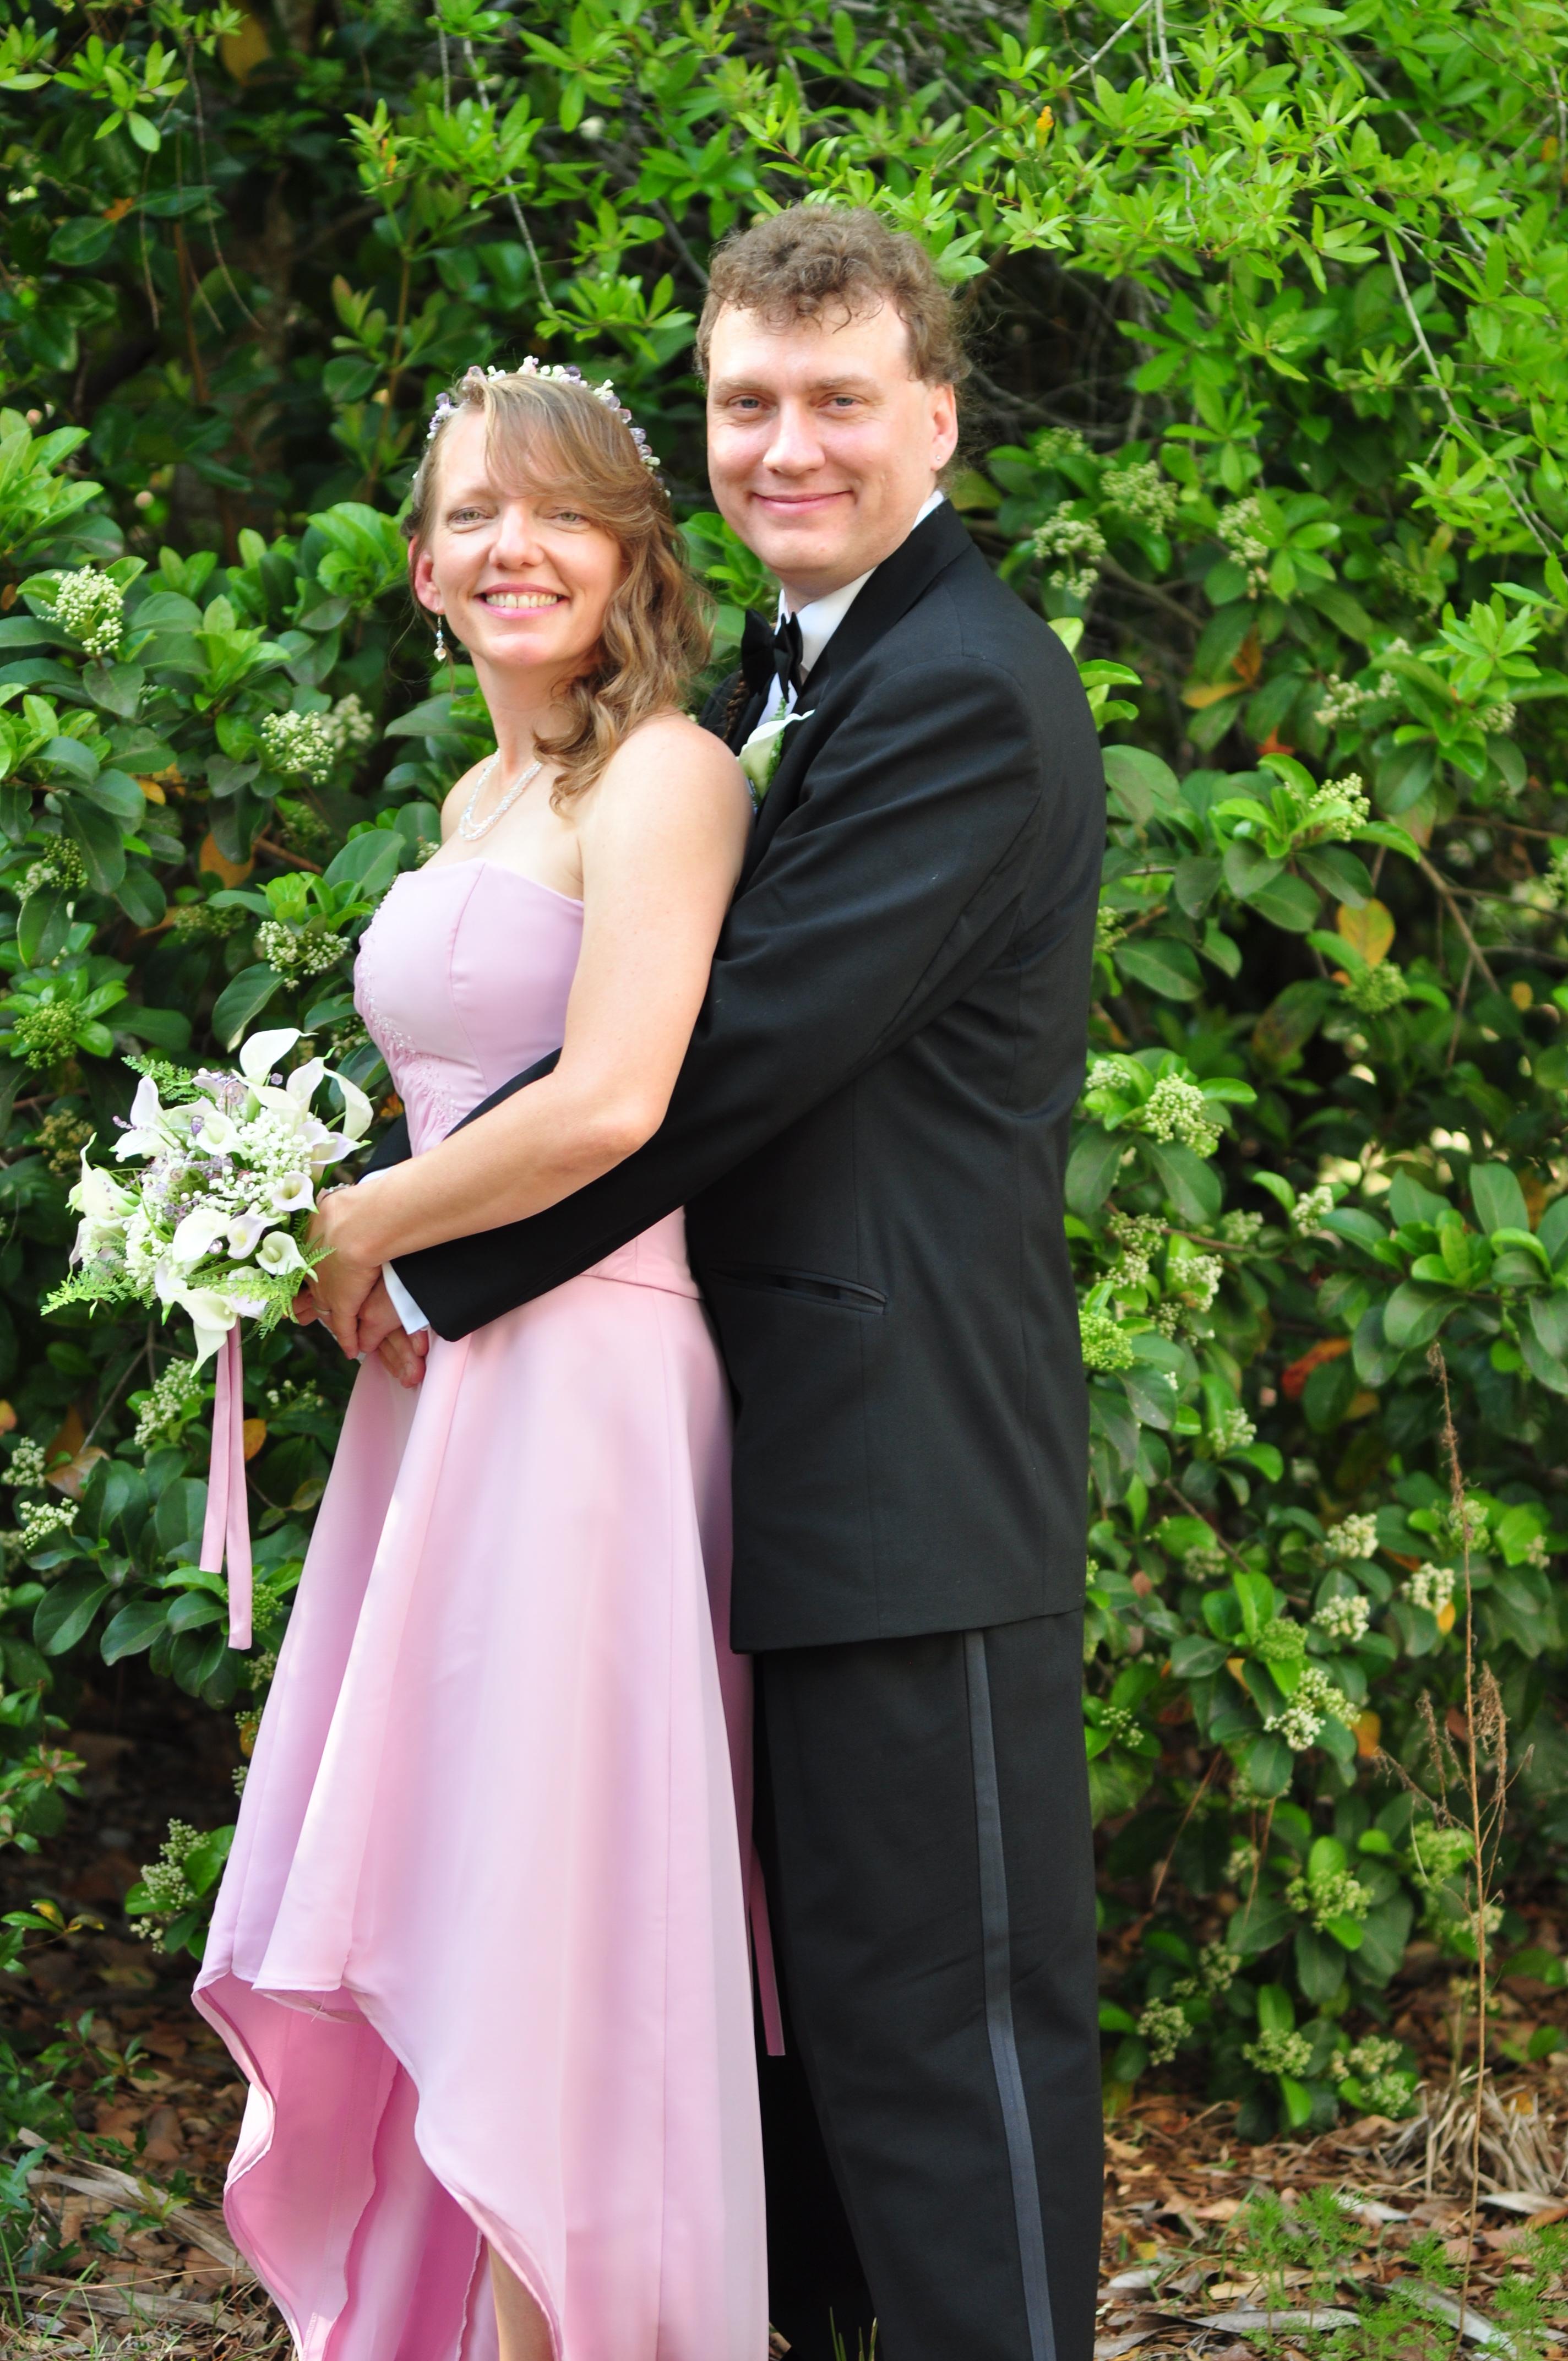 emily-and-travis-4-1-2013-april-fools-wedding-320